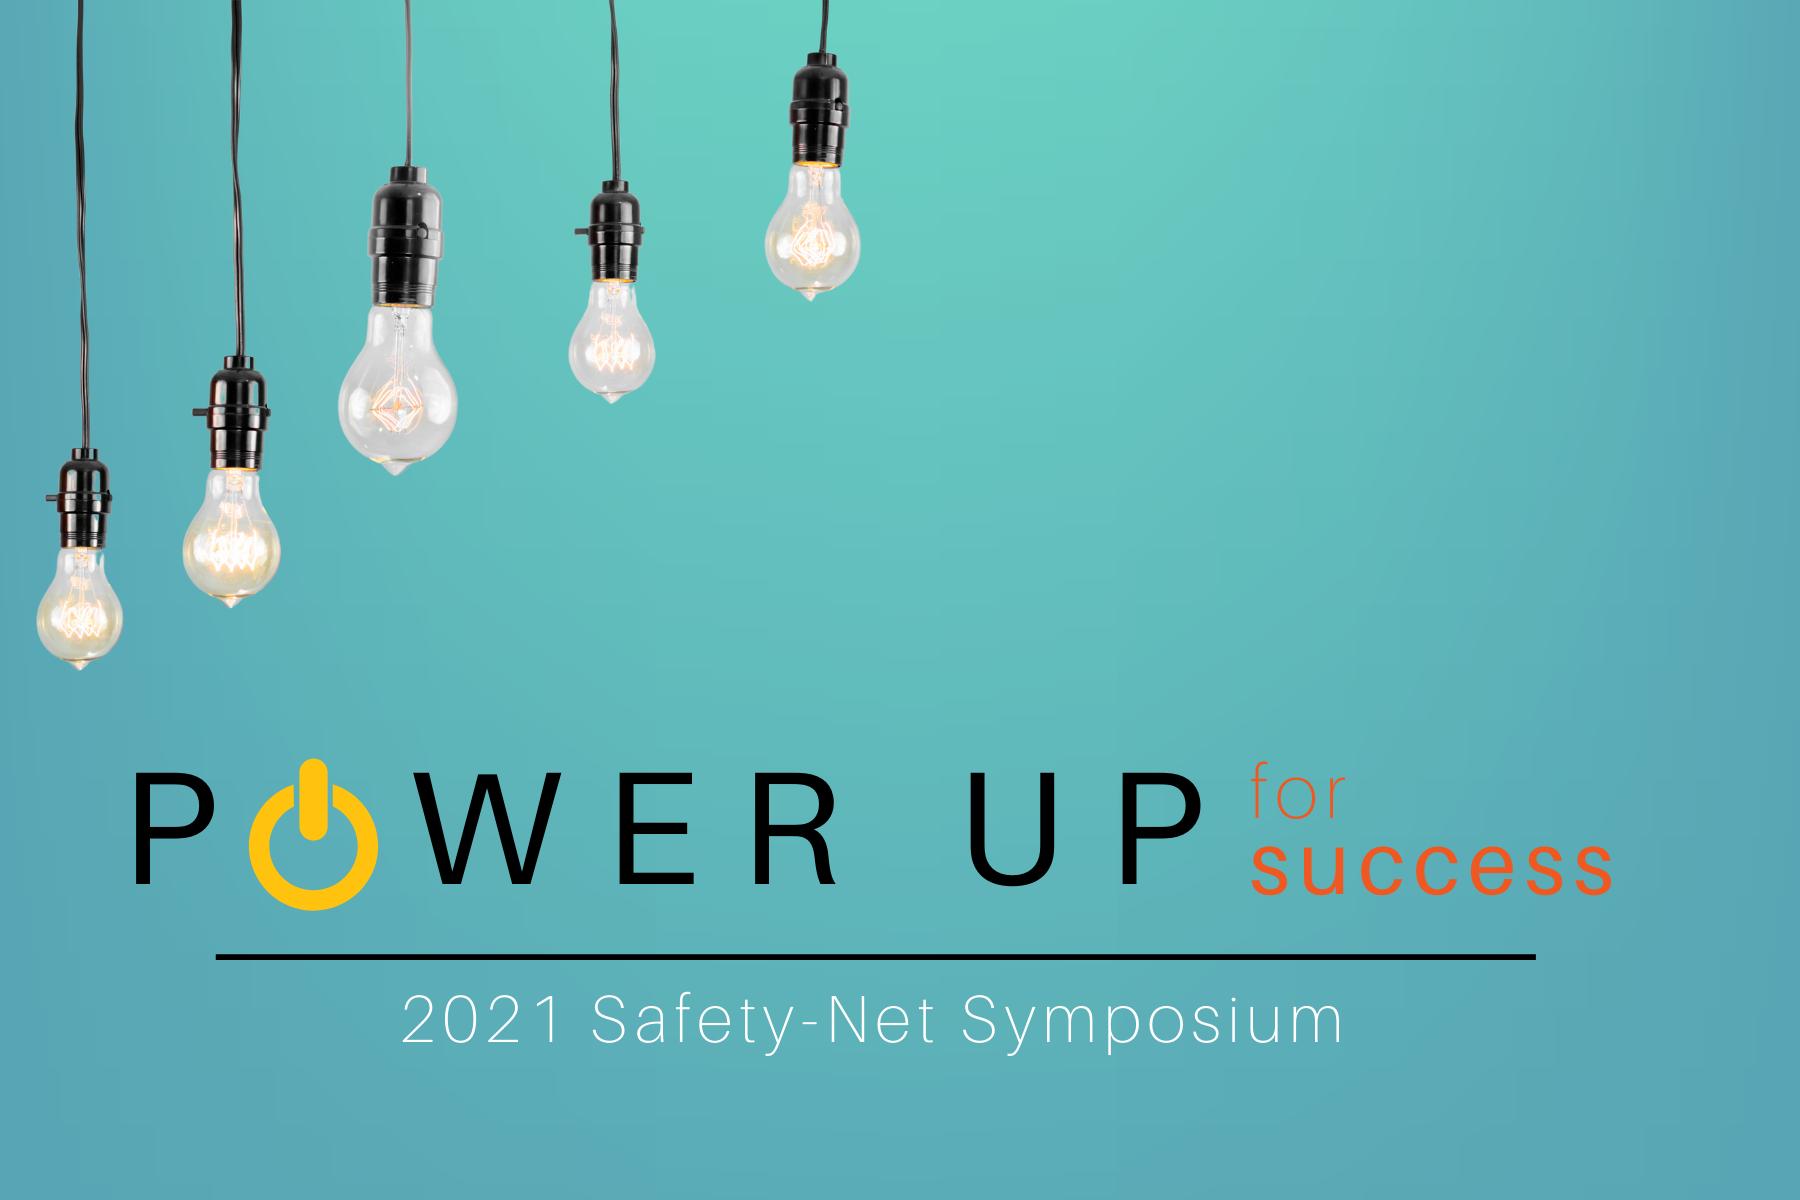 2021 Safety-Net Symposium